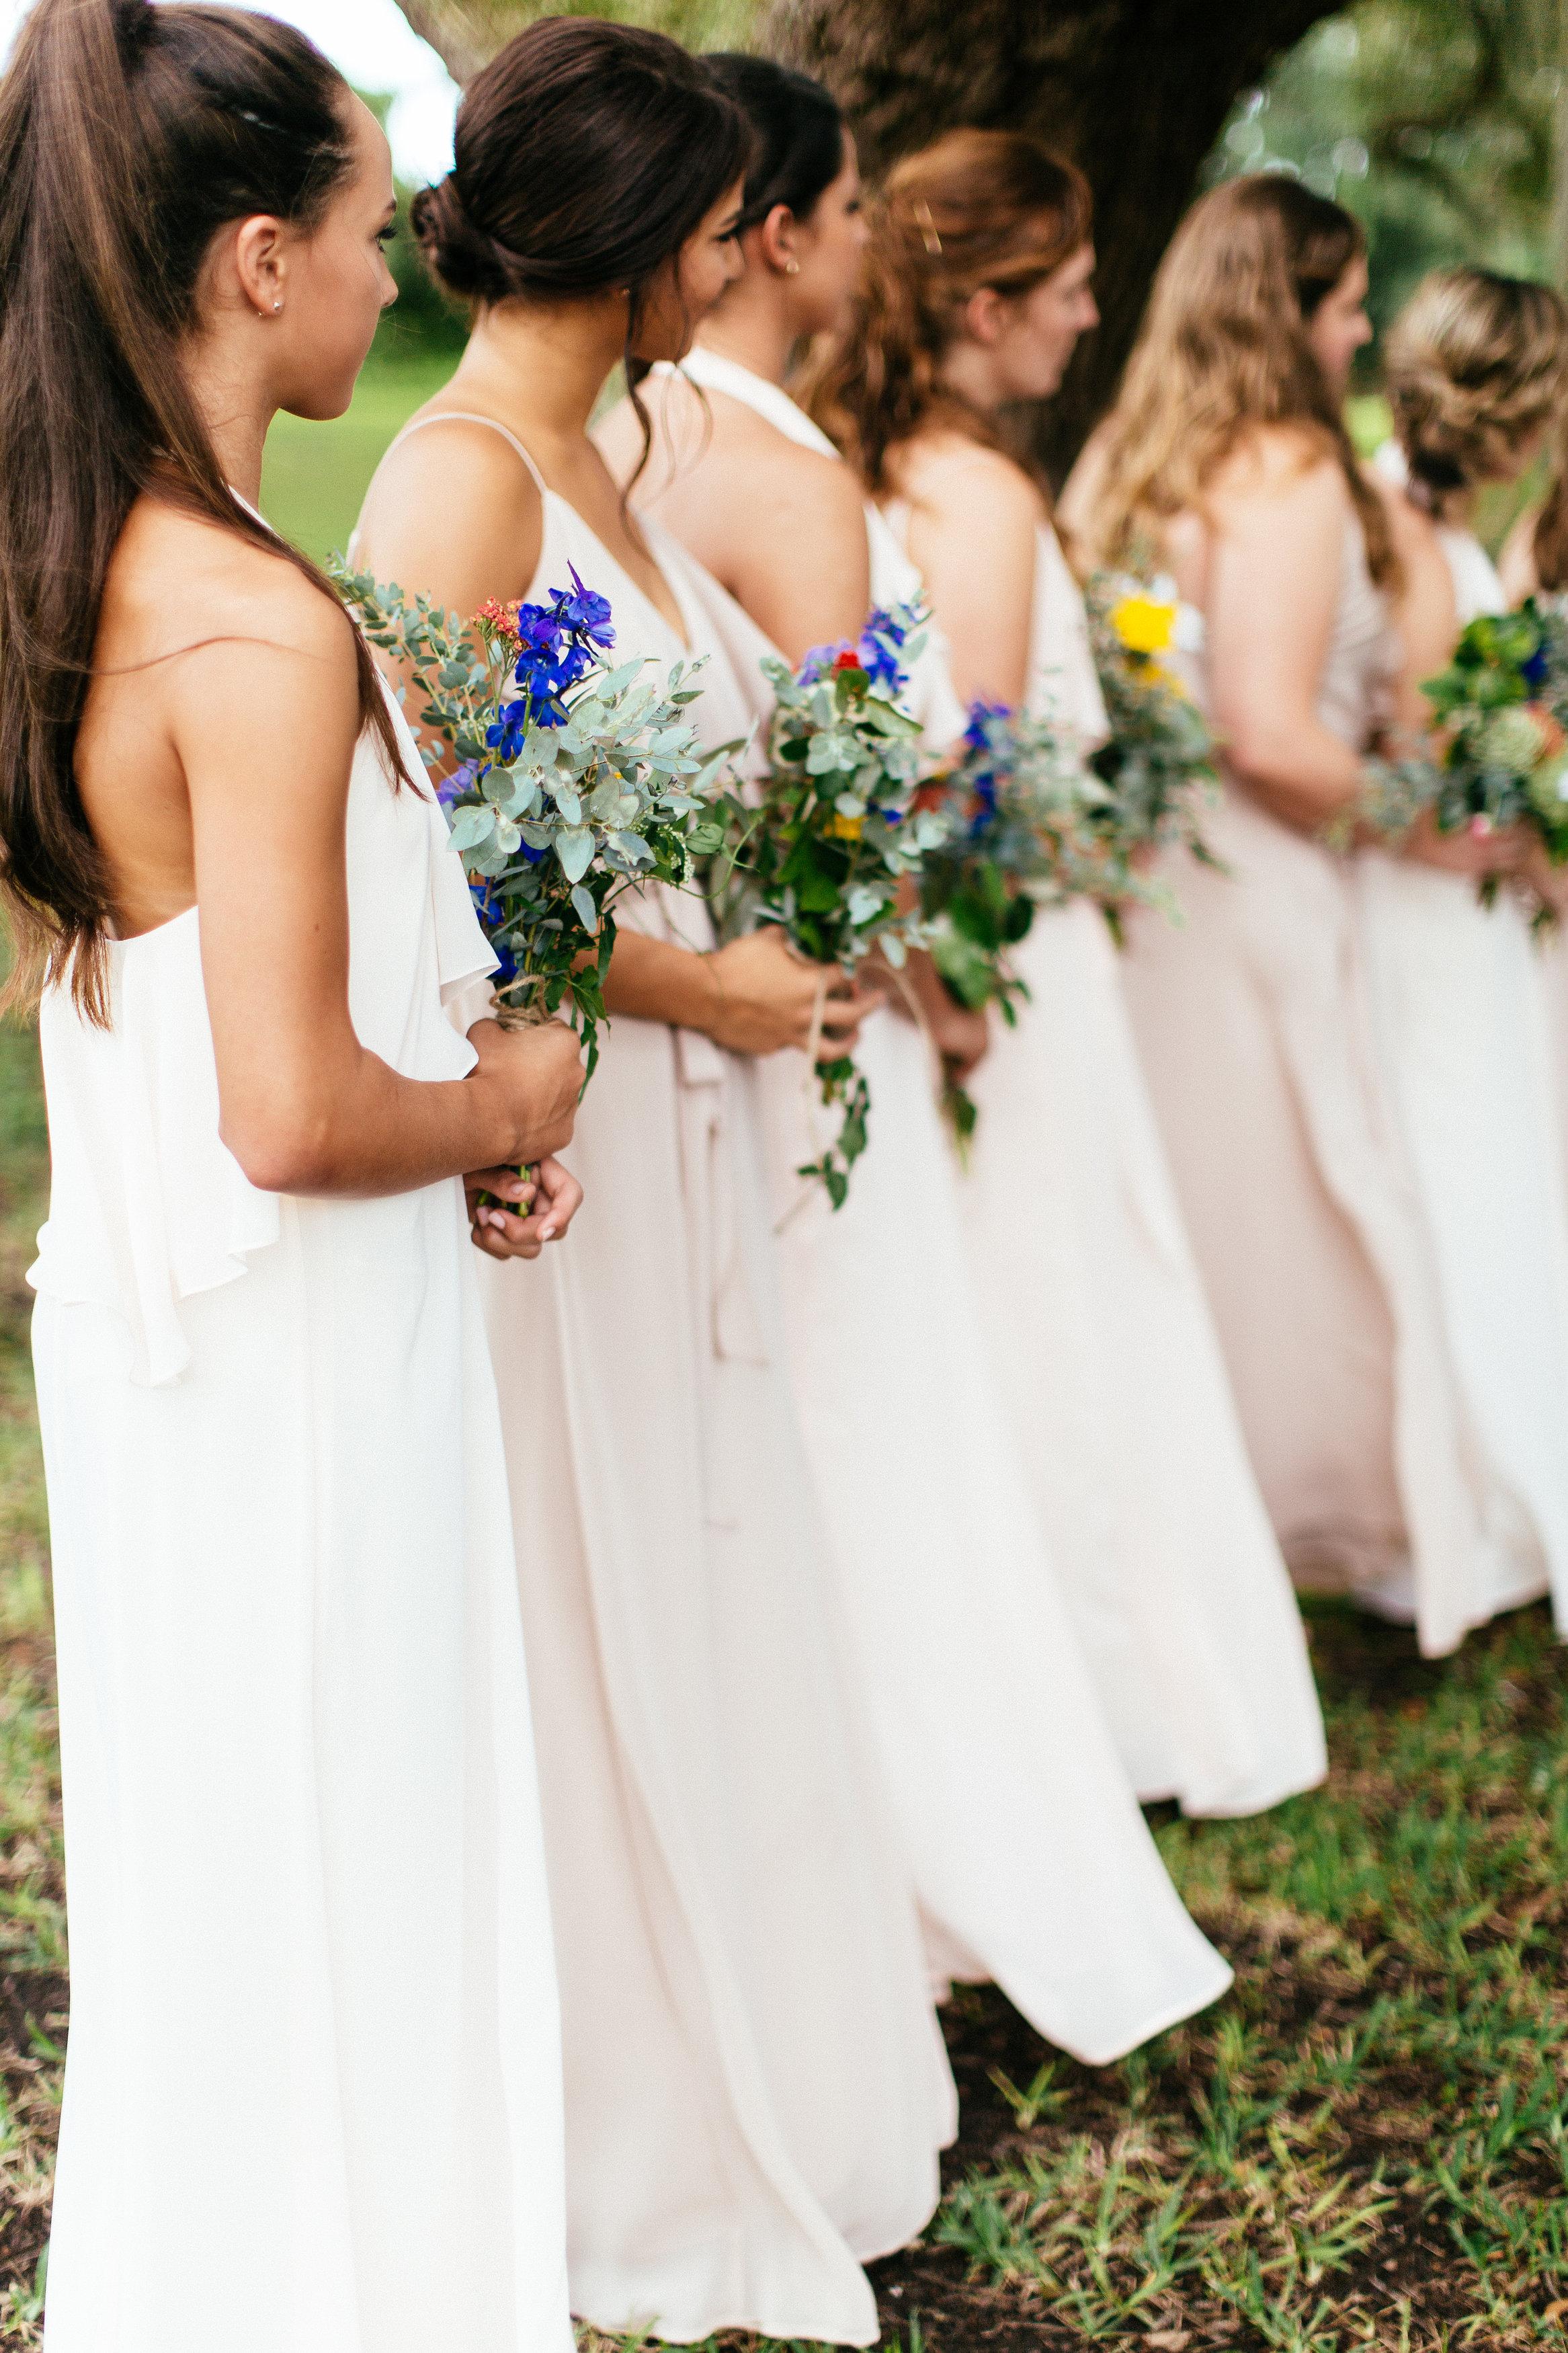 christina-karst-photography-ivory-and-beau-bridal-boutique-sarah-seven-lafayette-boho-bride-boho-bridal-boutique-indie-bridal-boutique-savannah-bridal-boutique-savannah-wedding-dresses-savannah-bridal-gowns-13.jpg